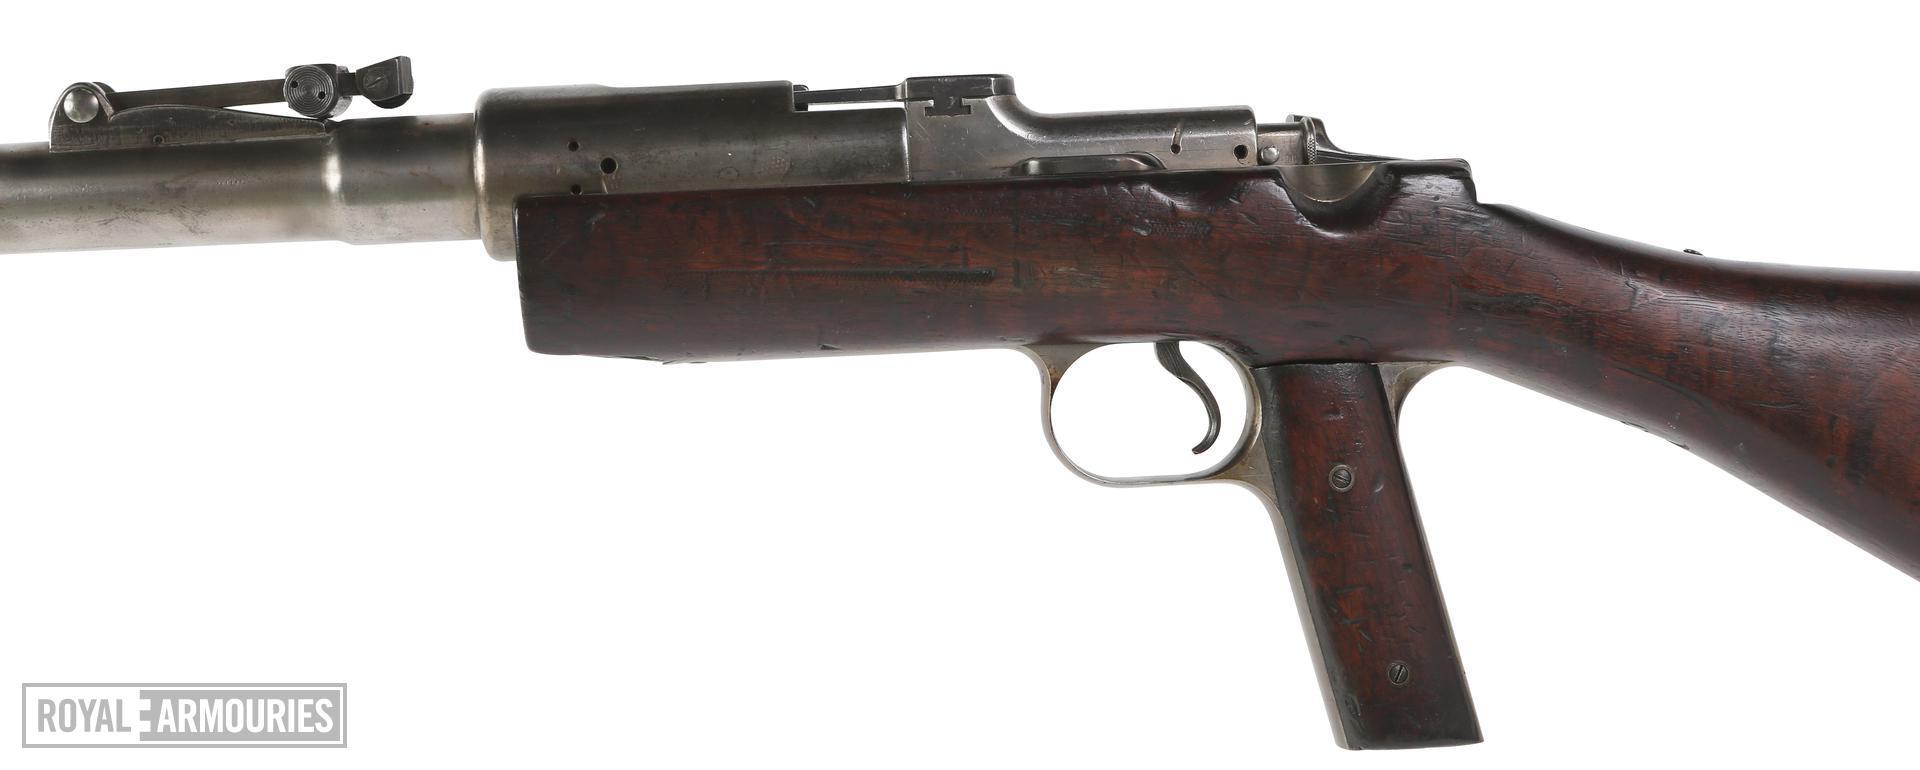 PR.1726 - Centrefire breech-loading anti-tank rifle